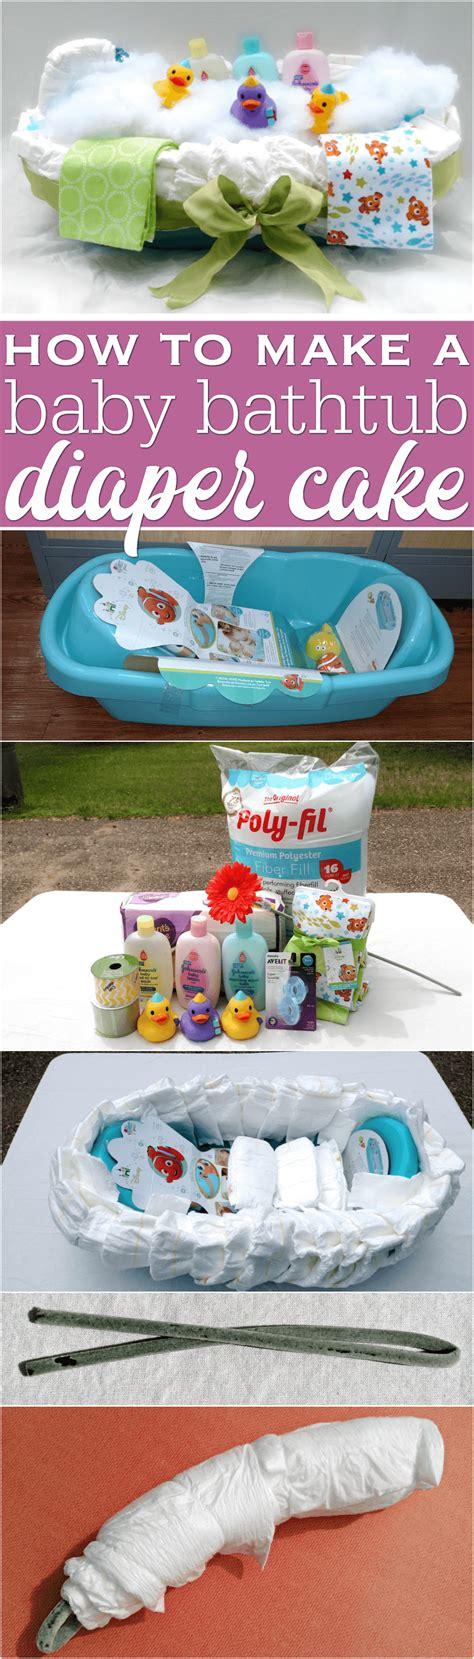 how to make a bathtub diaper cake how to make a baby bathtub diaper cake with step by step directions